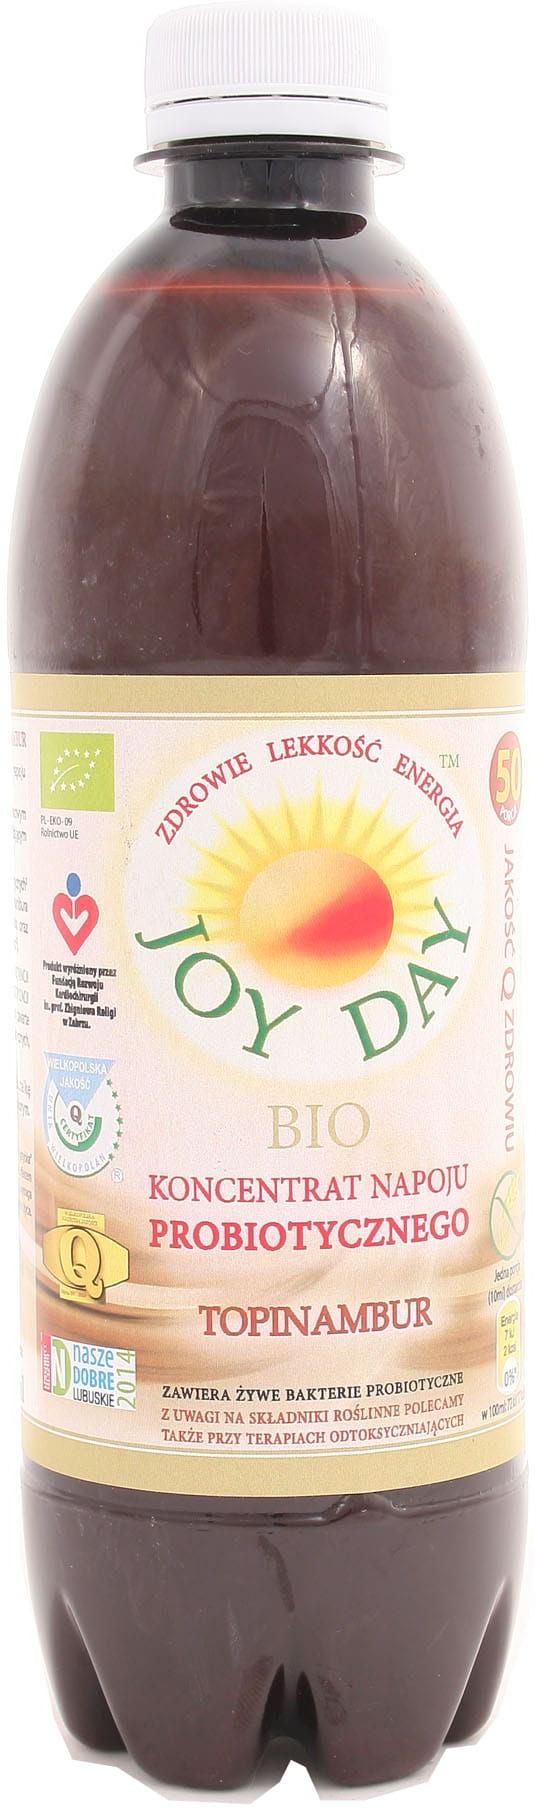 Koncentrat napoju probiotycznego Topinambur BIO - Joy Day - 500ml